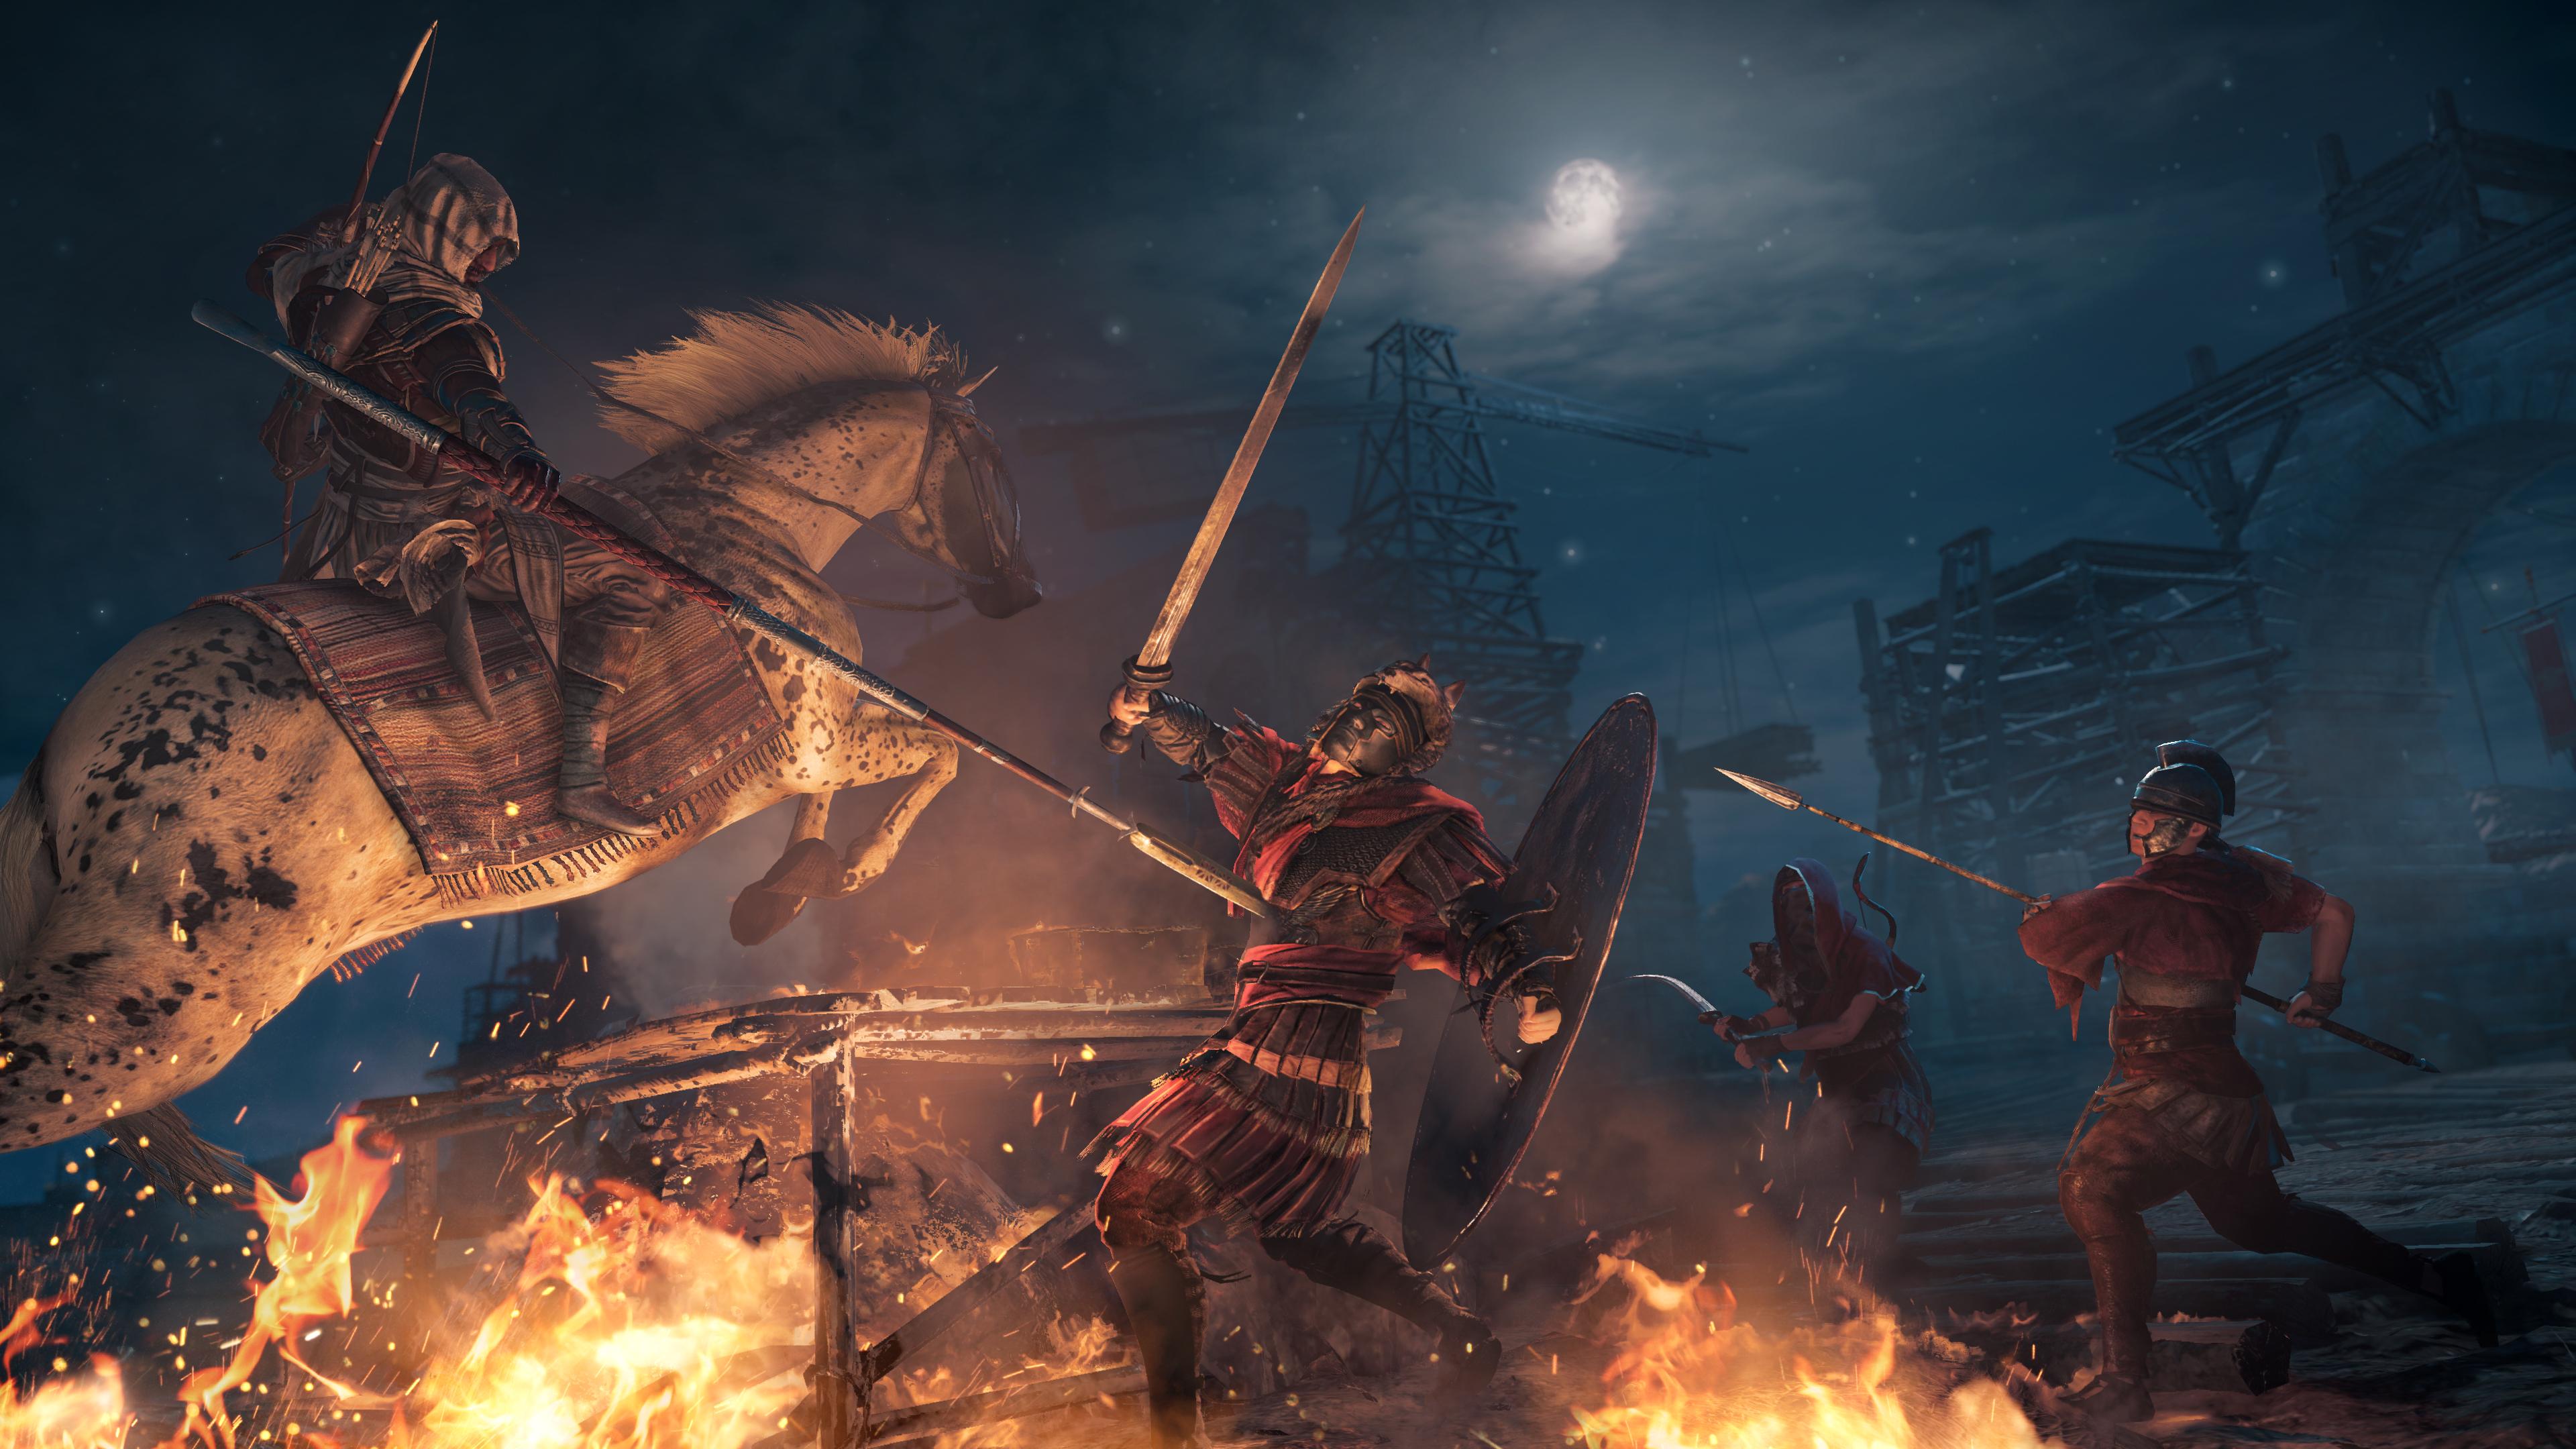 Assassin S Creed Origins Hd Wallpaper 2179000 Zerochan Anime